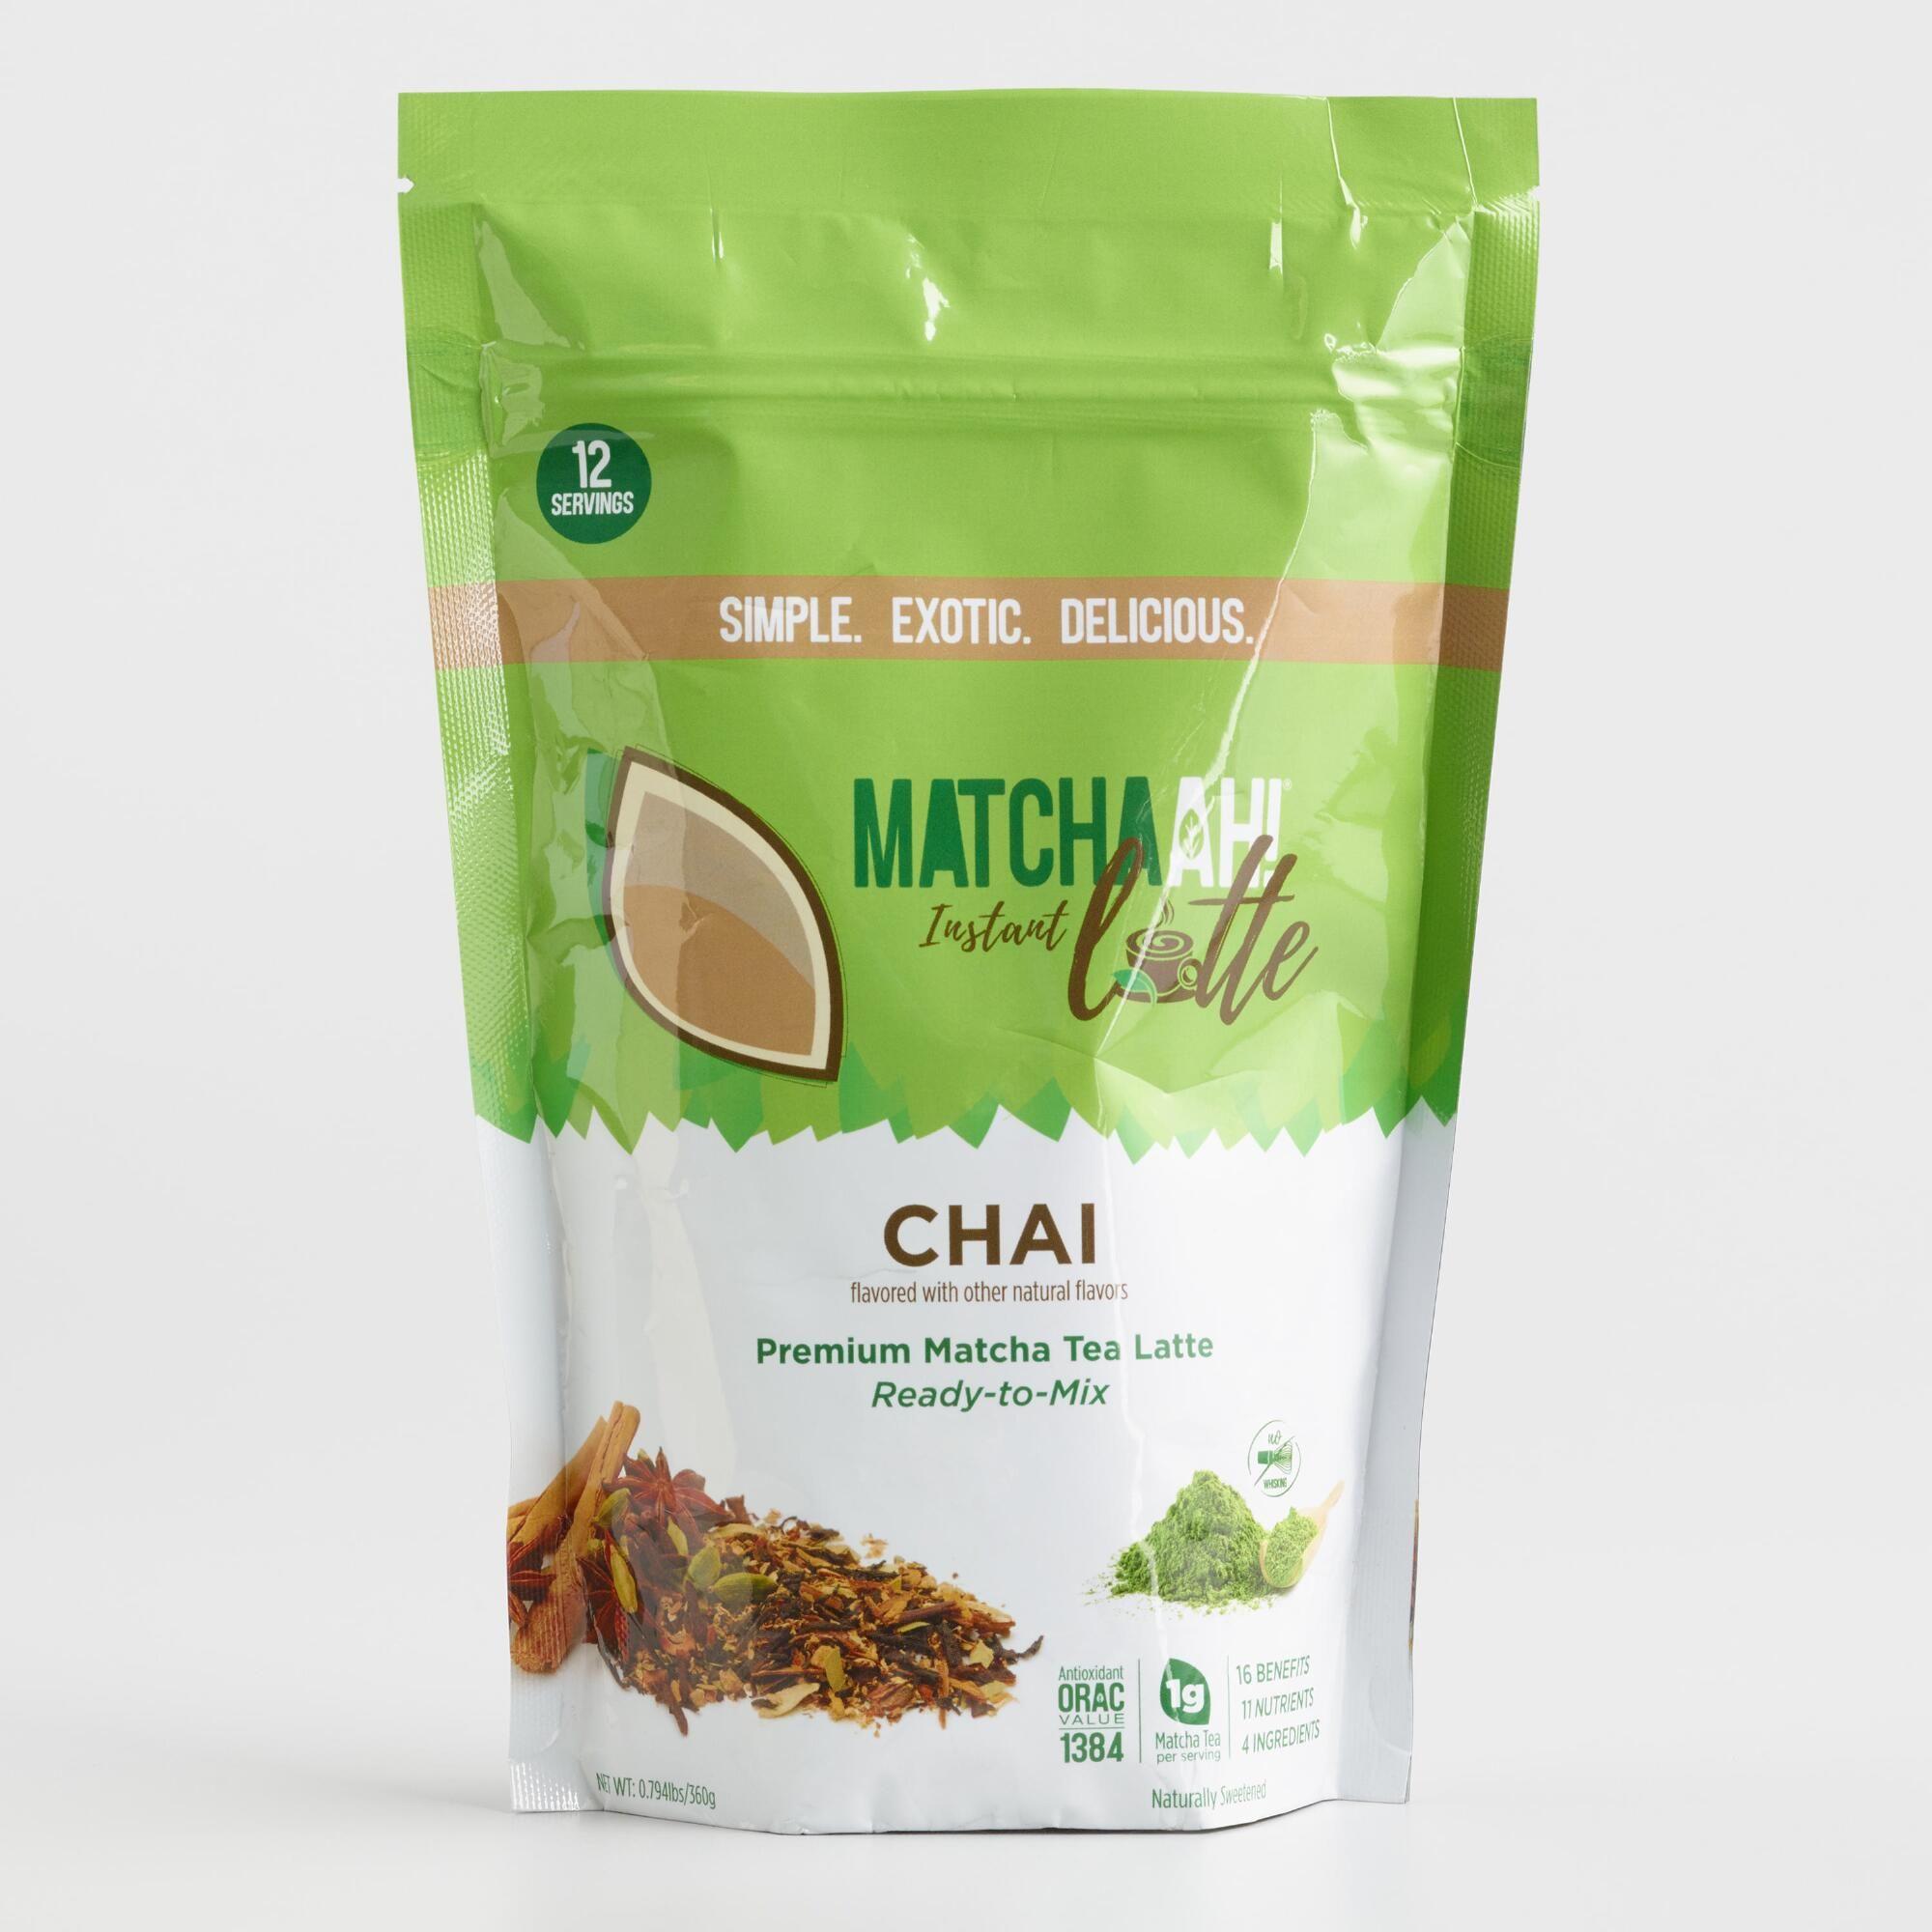 Matchaah Chai Matcha Tea Latte Mix By World Market